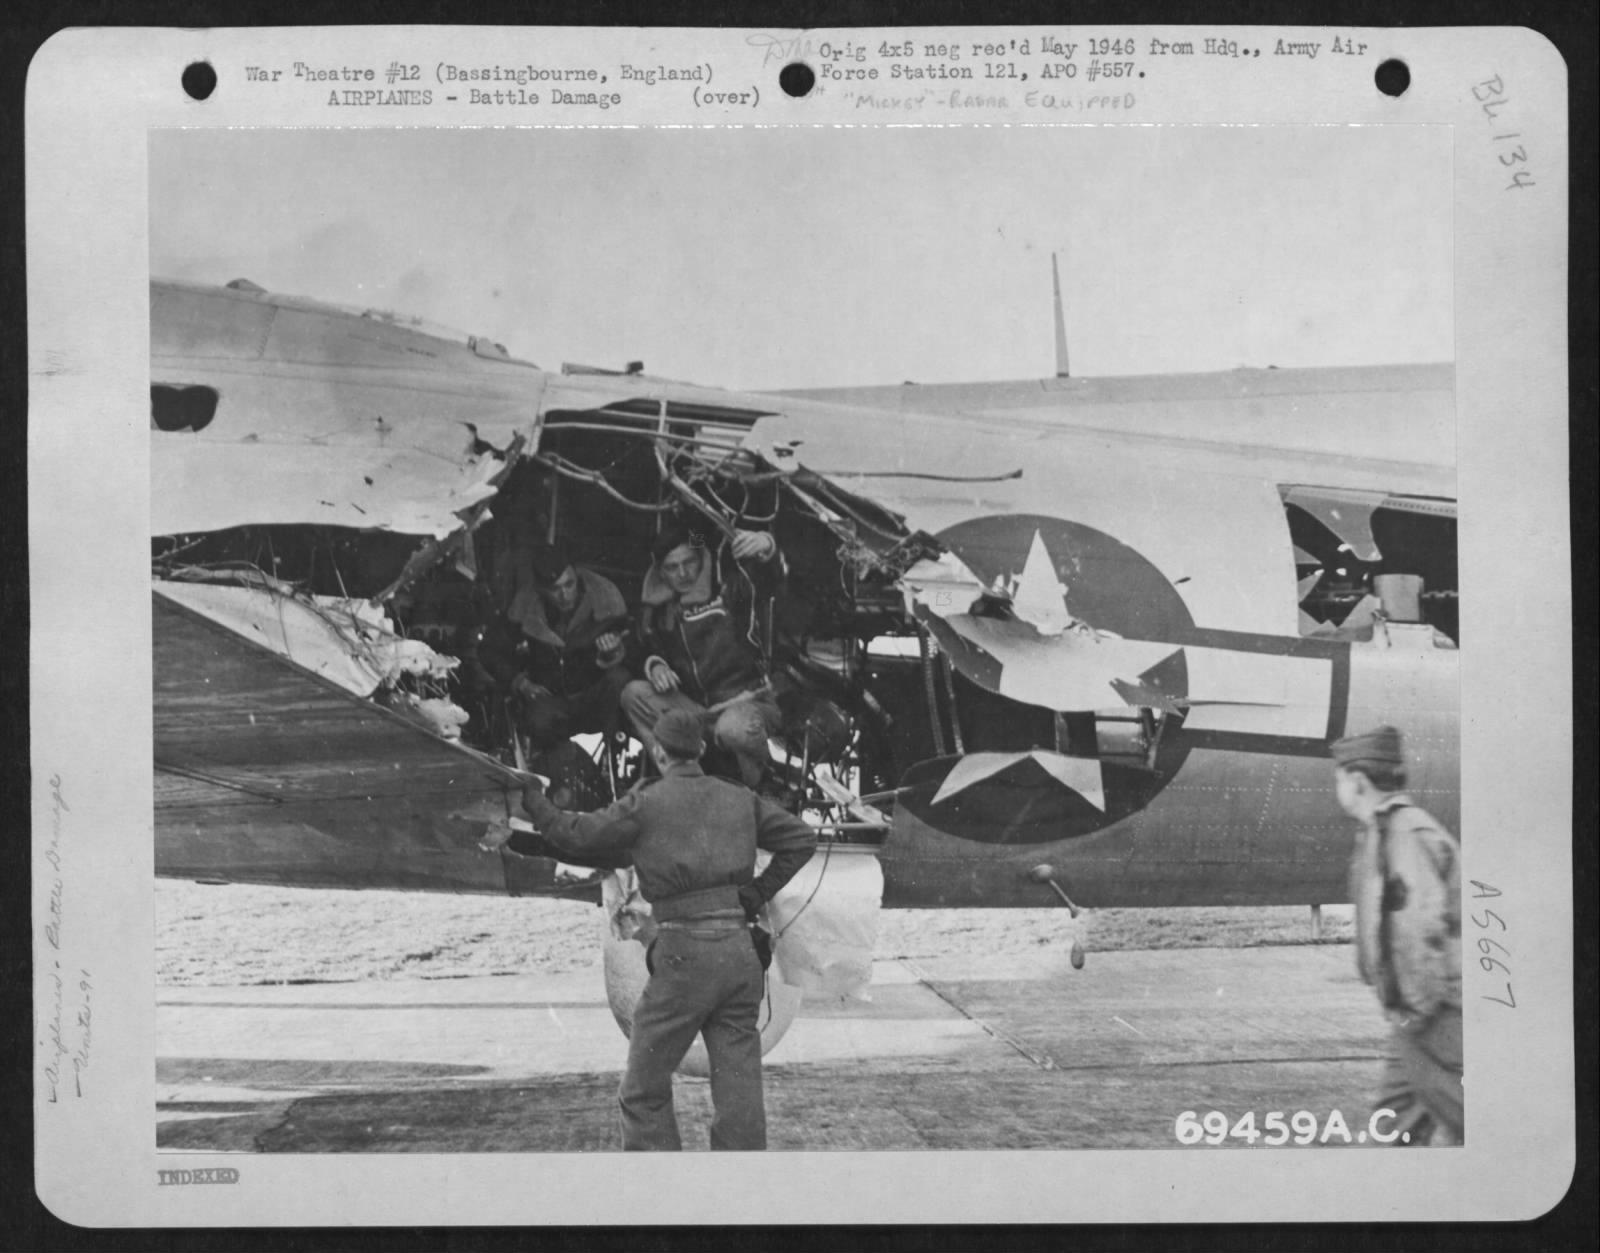 B-17G mit beschädigtem Rumpf